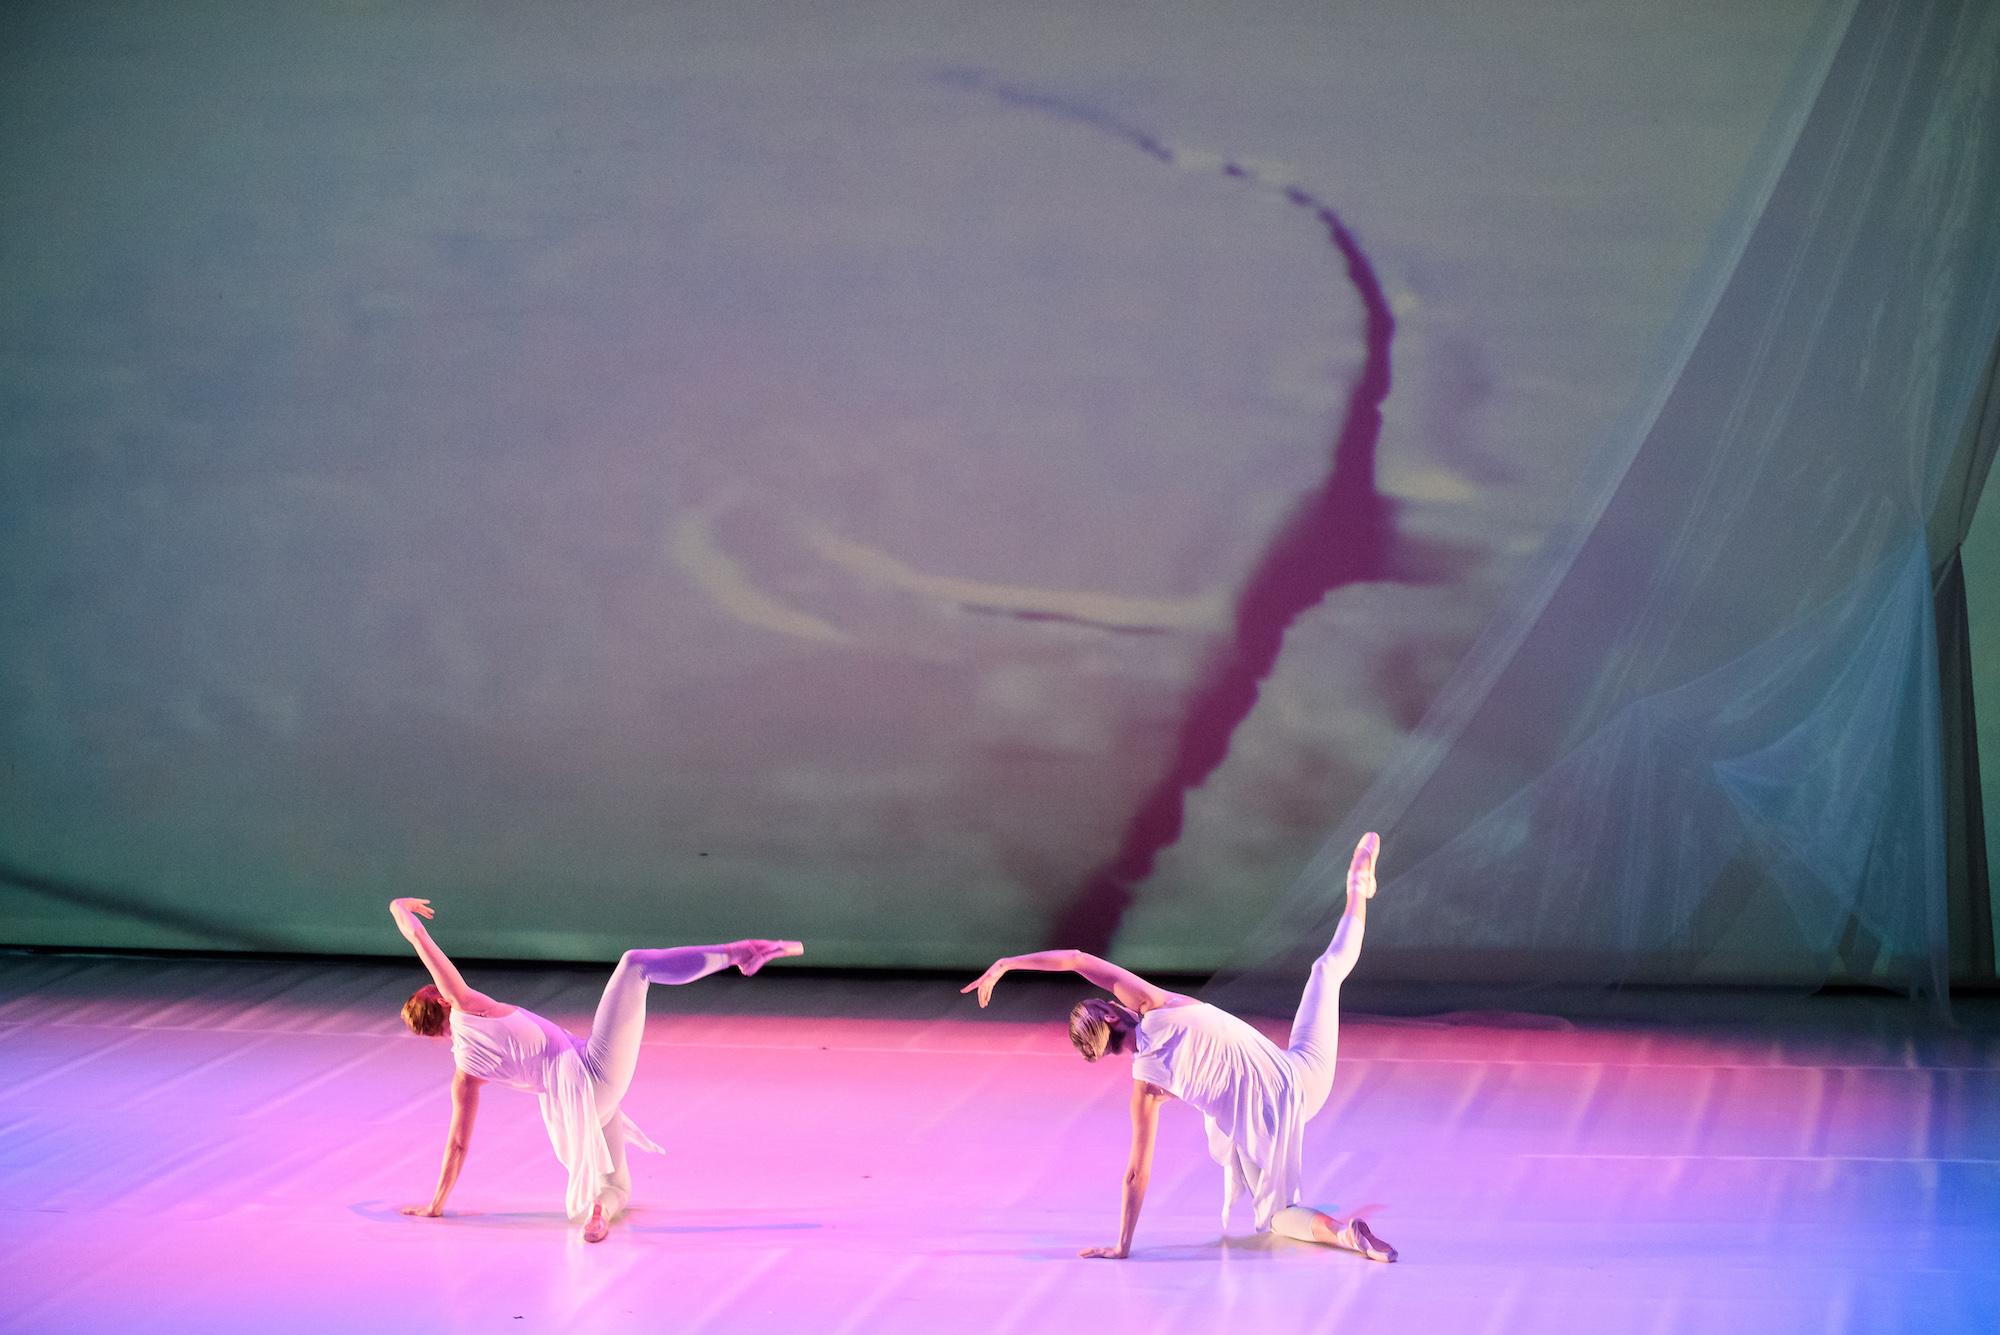 Etta Carrie kneeling pretty legs Moveius-Glacier-Crash-of-Fall-20190221-RobCannon-015.jpg